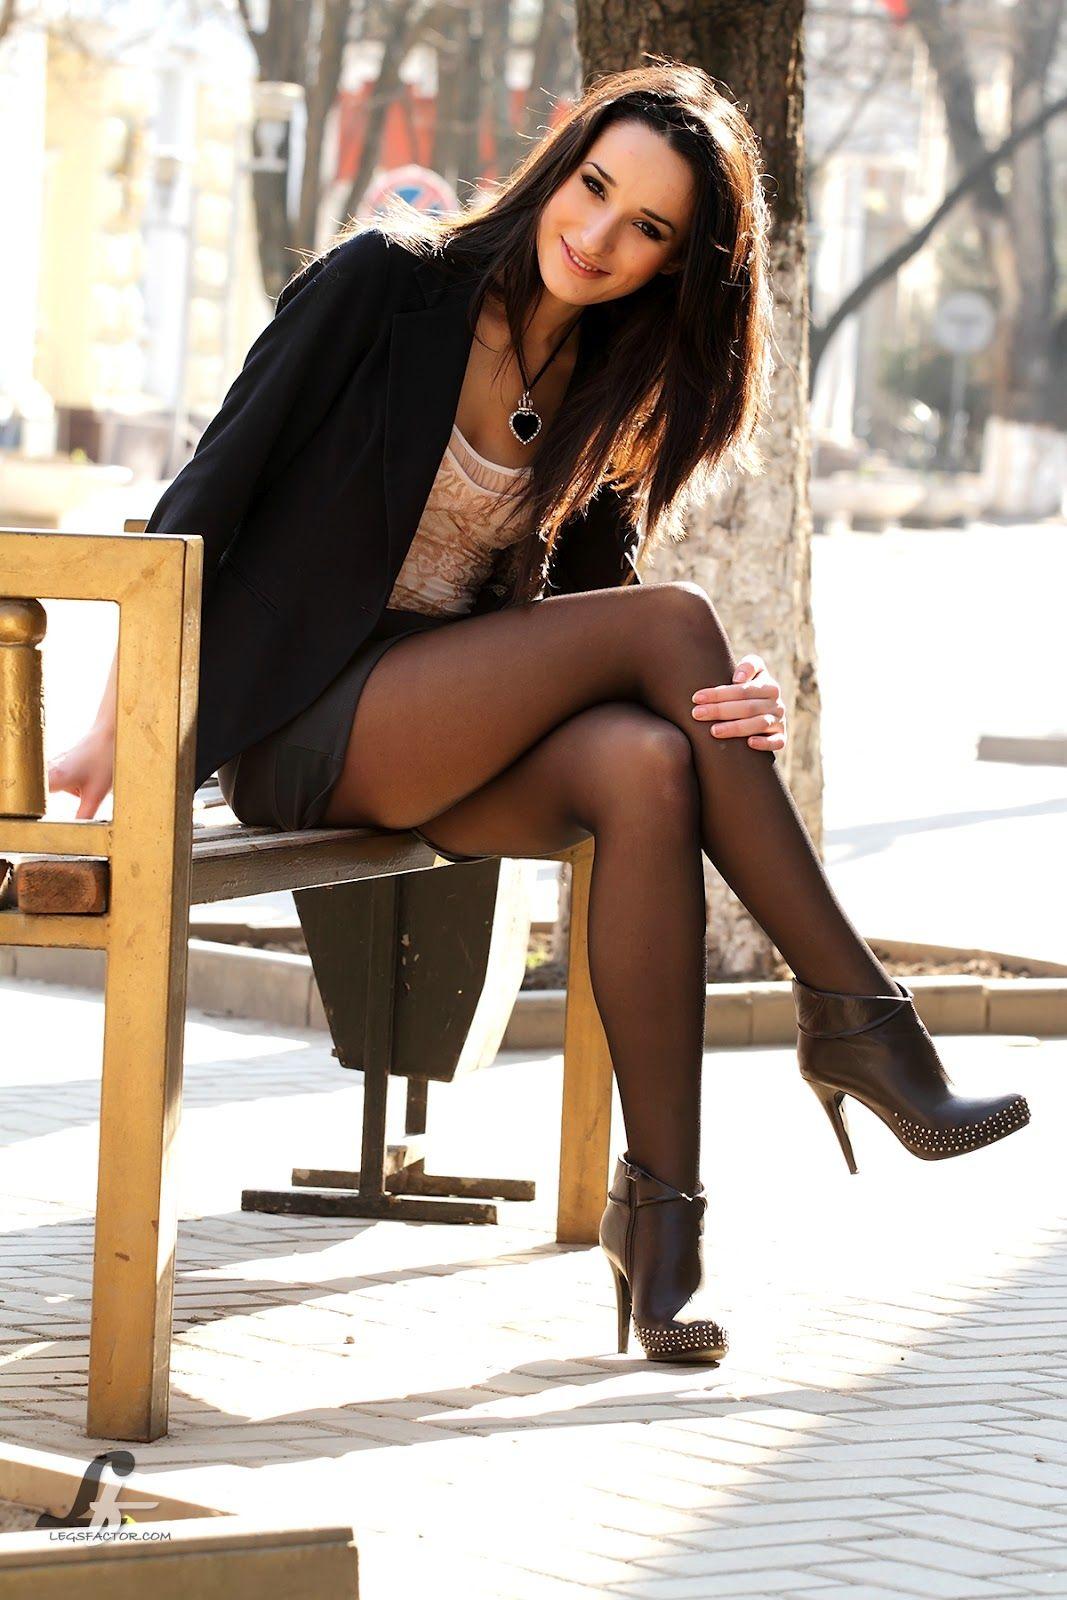 Brilliant  Pretty Woman In White Sweatshirt And Short Black Skirt And HeelsJPG